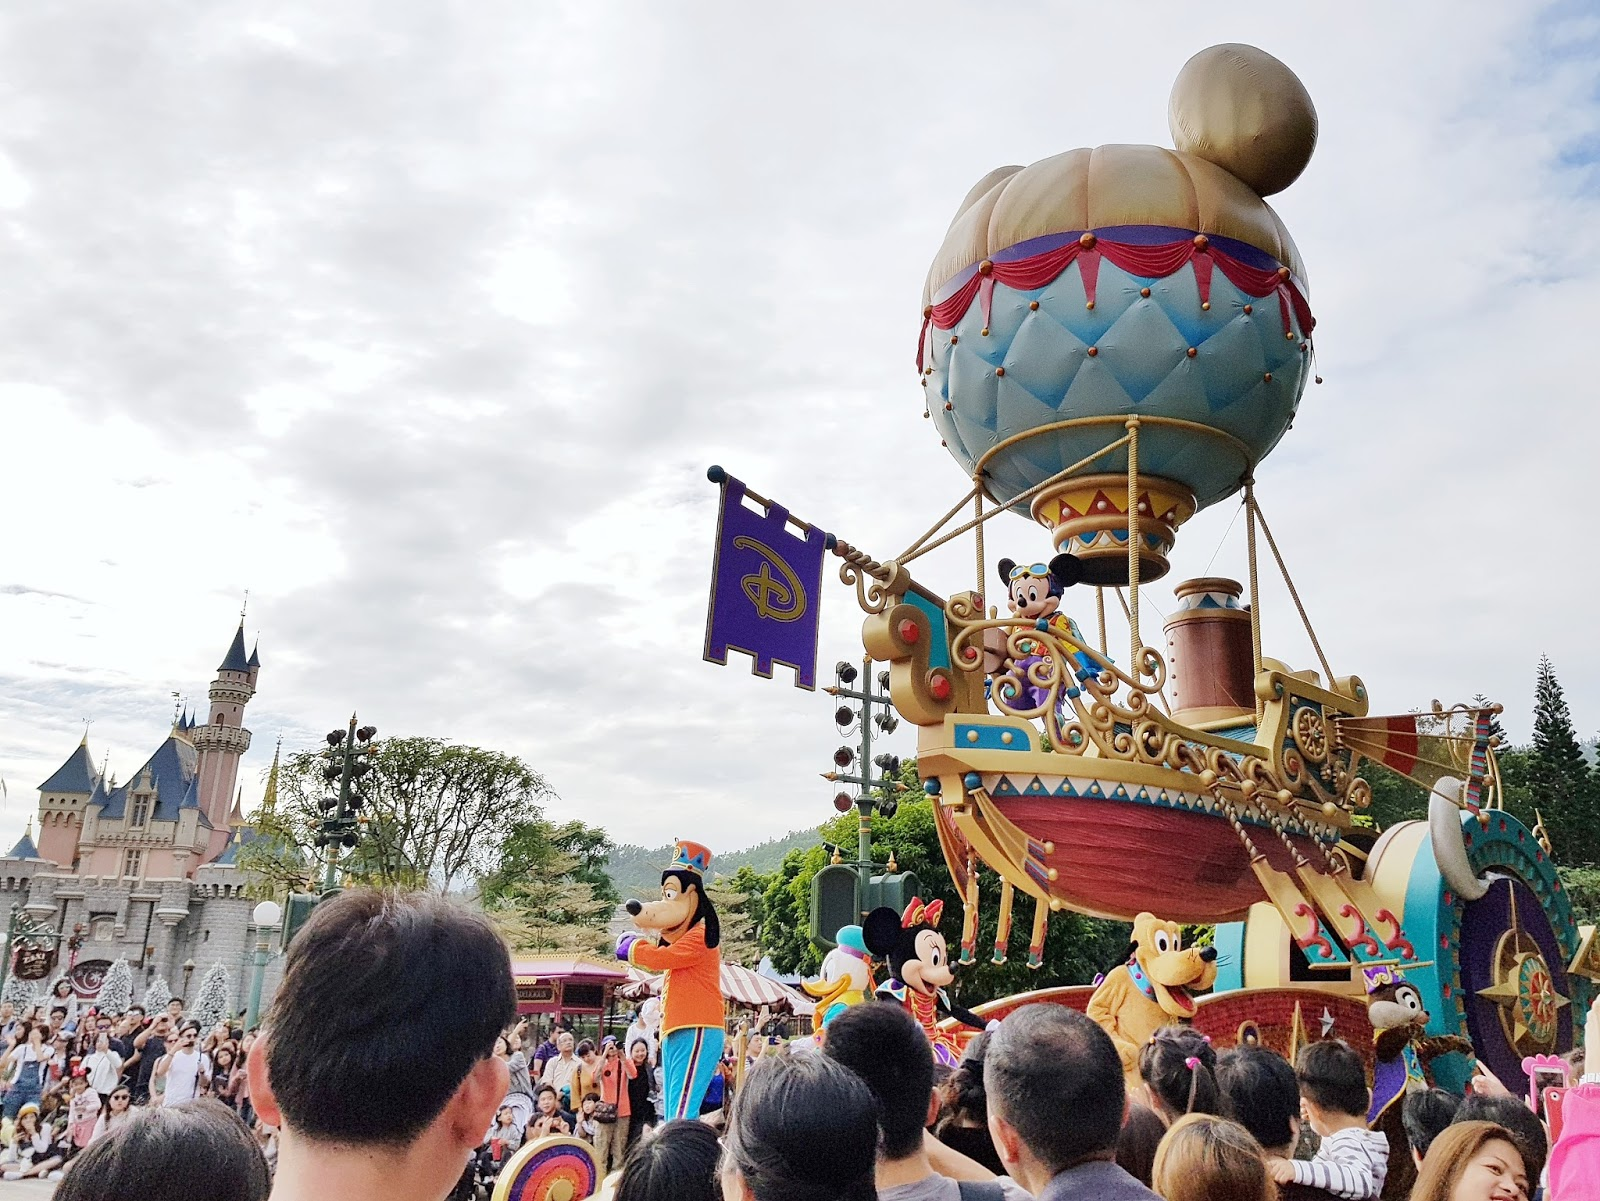 Celebrating Christmas in Hong Kong Disneyland